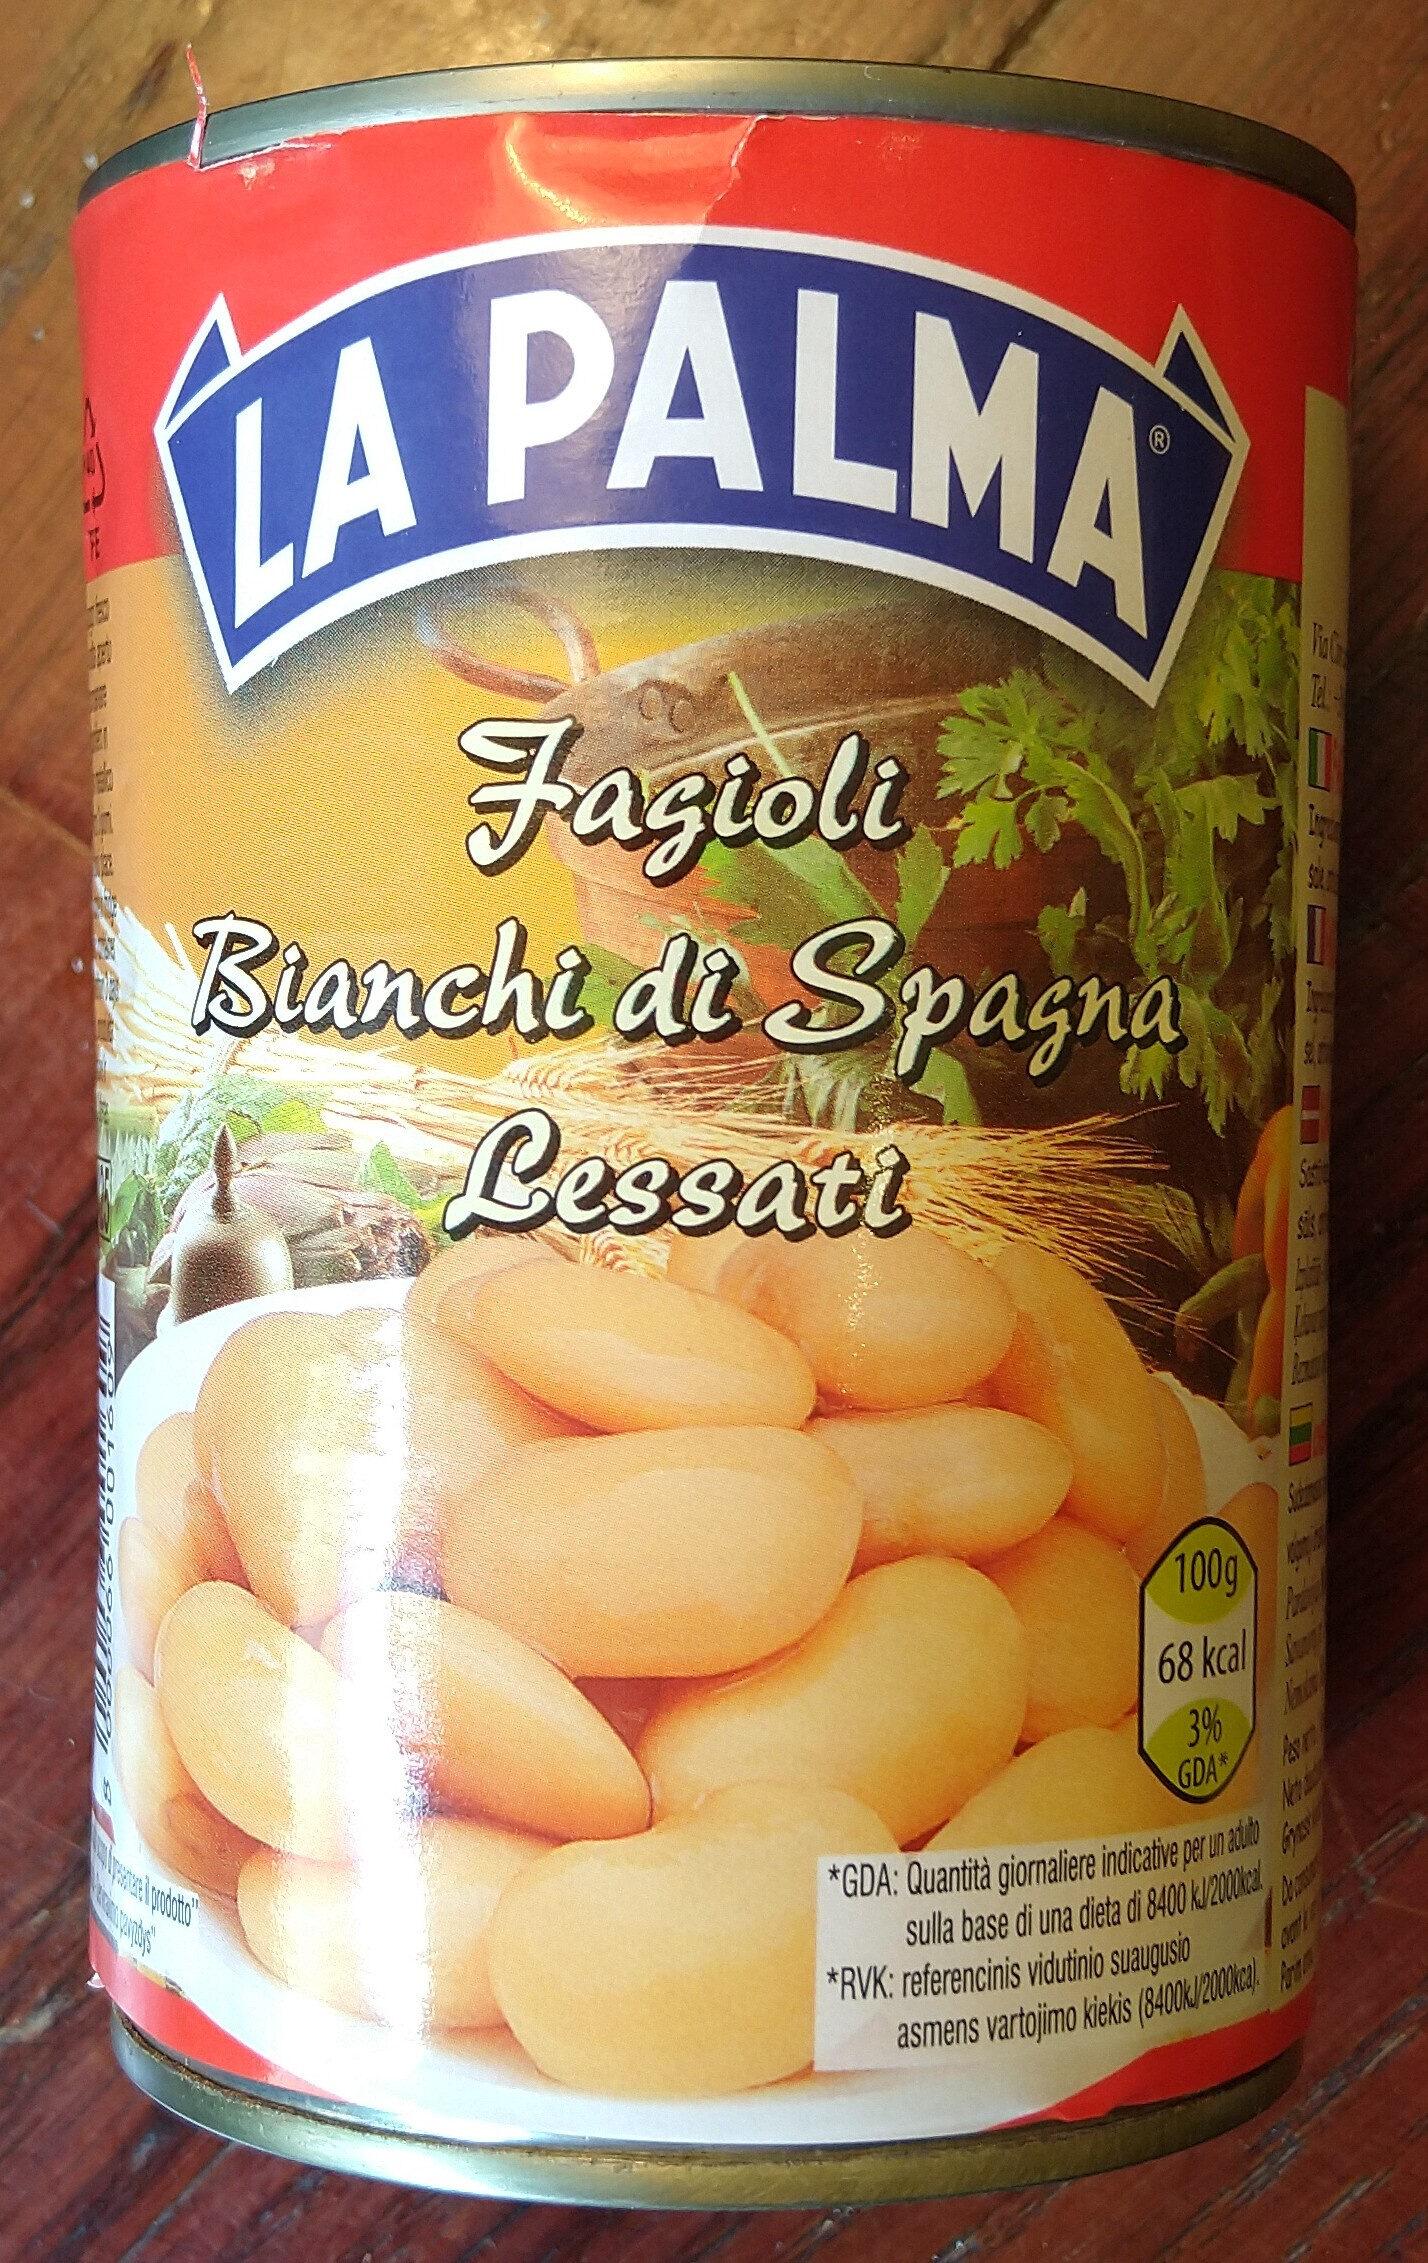 Fagioli Bianchi di Spagna Lessati - Product - it